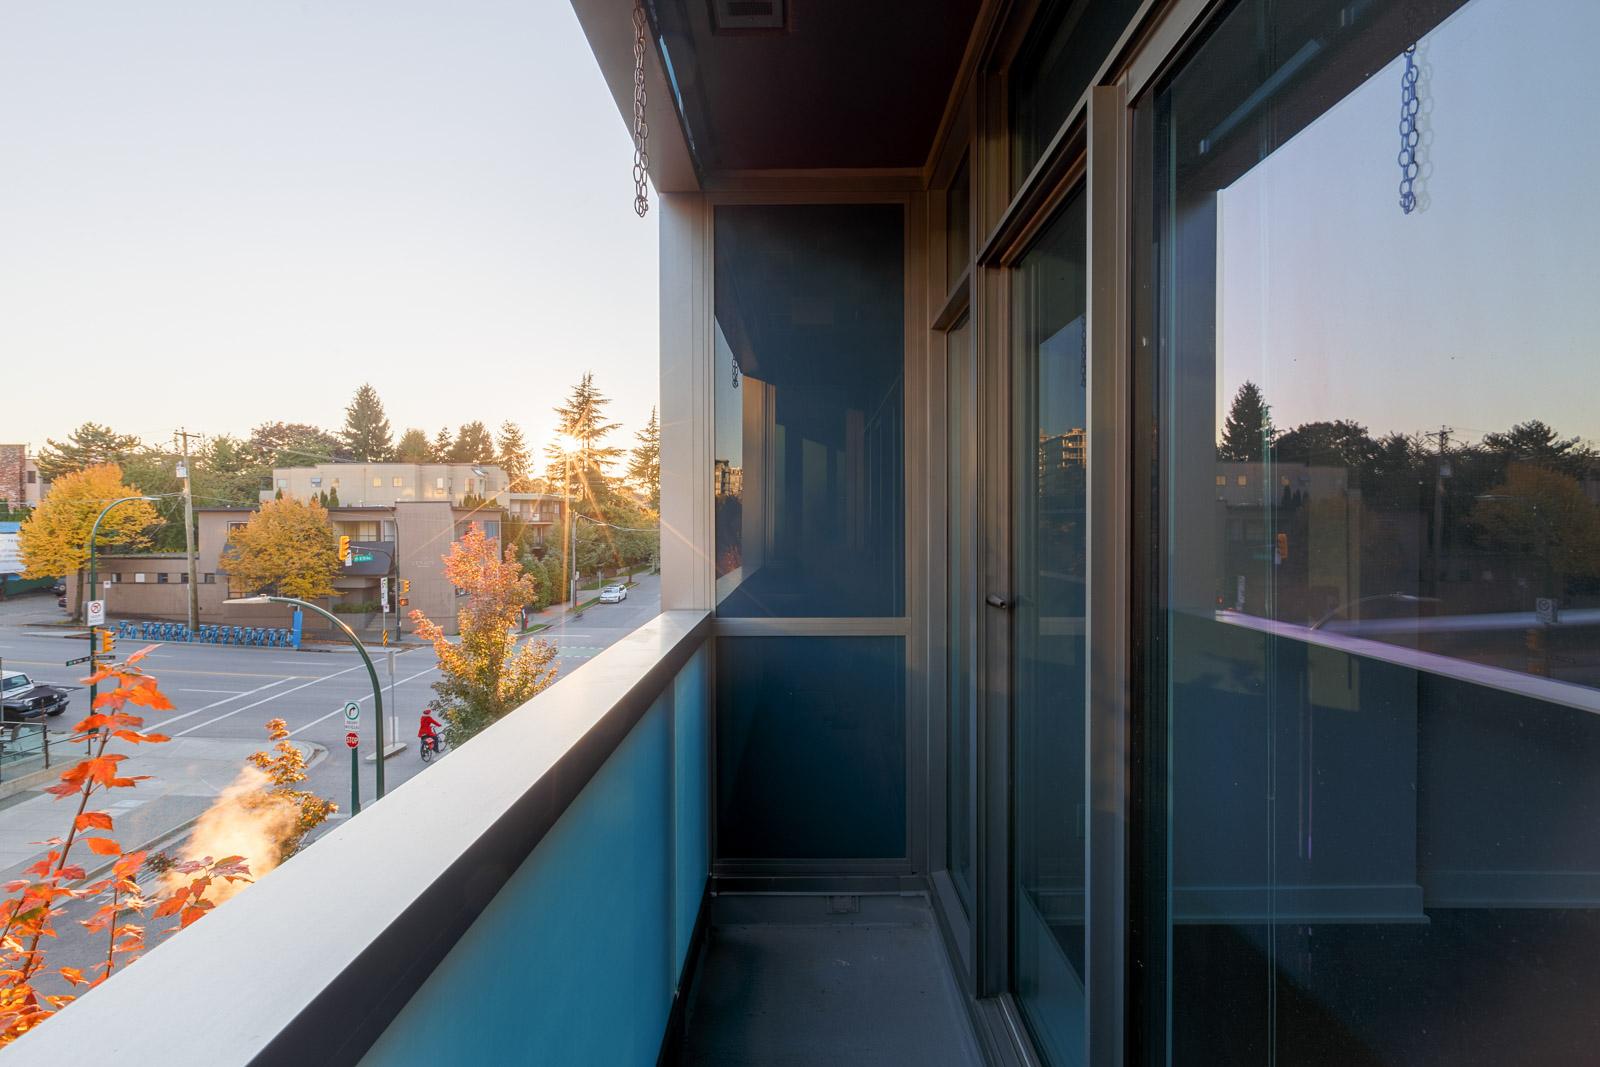 Balcony in Kits360 condo managed by Birds Nest Properties